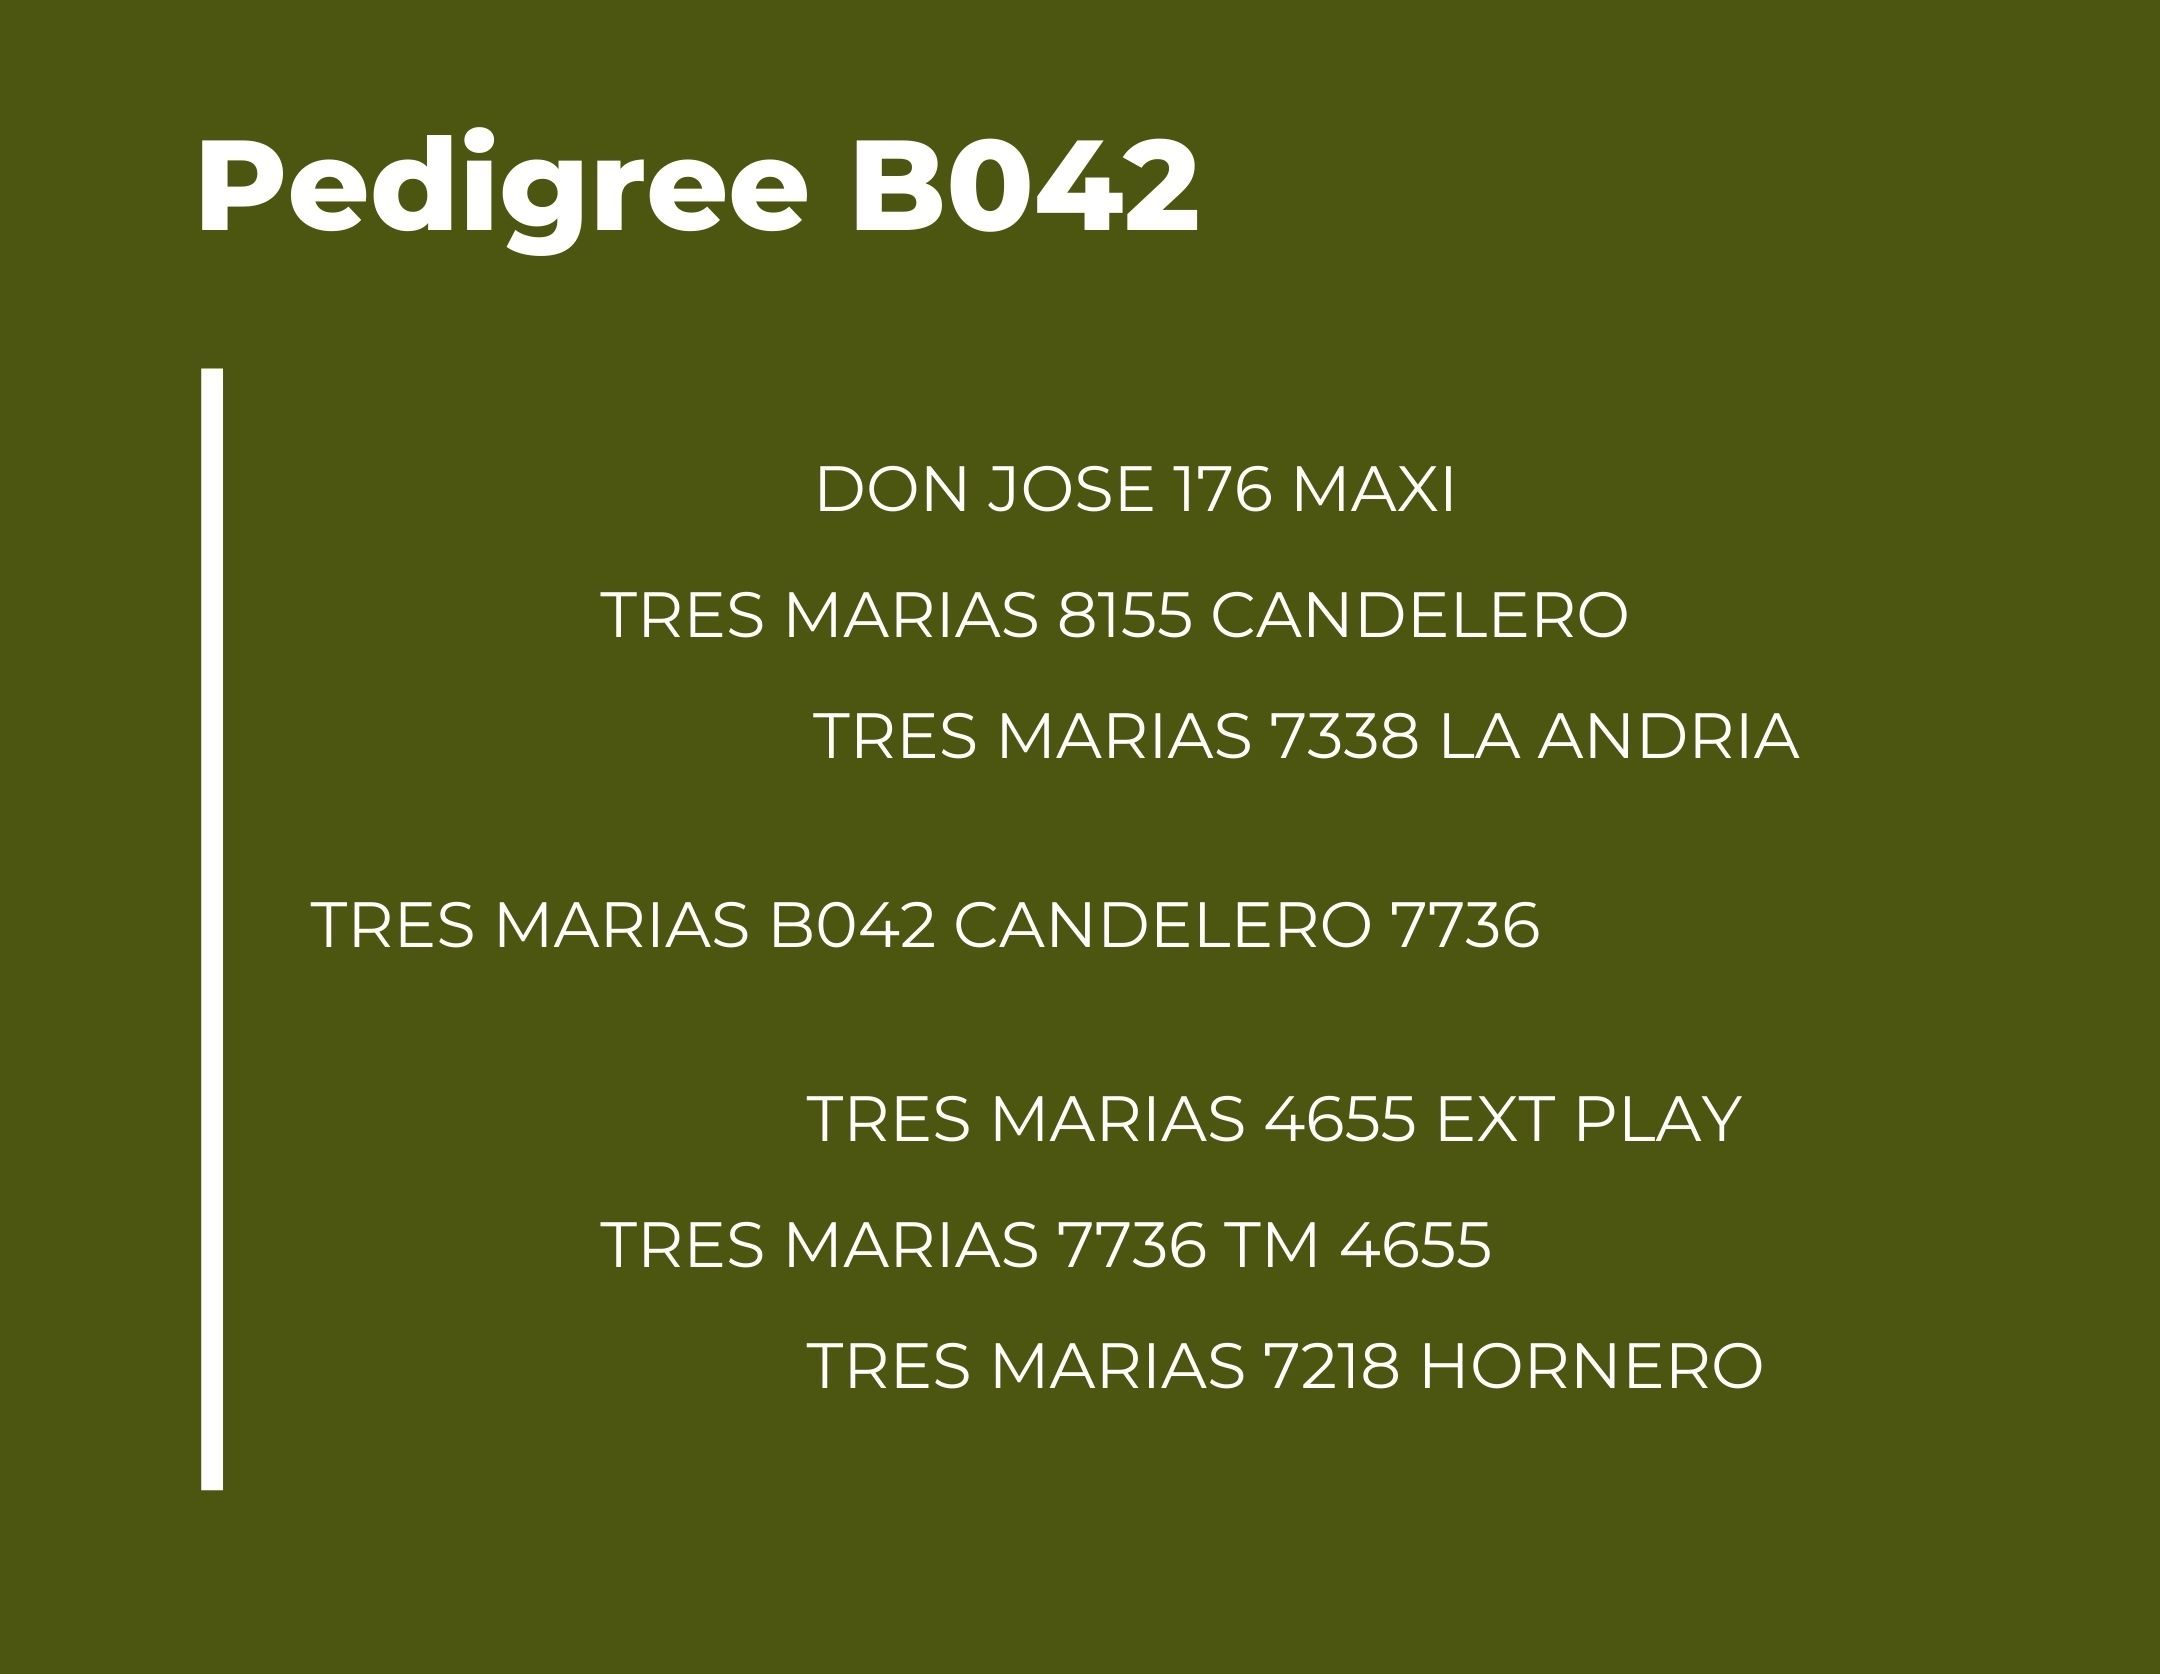 Catalogo Tres Marias Pedigree B042